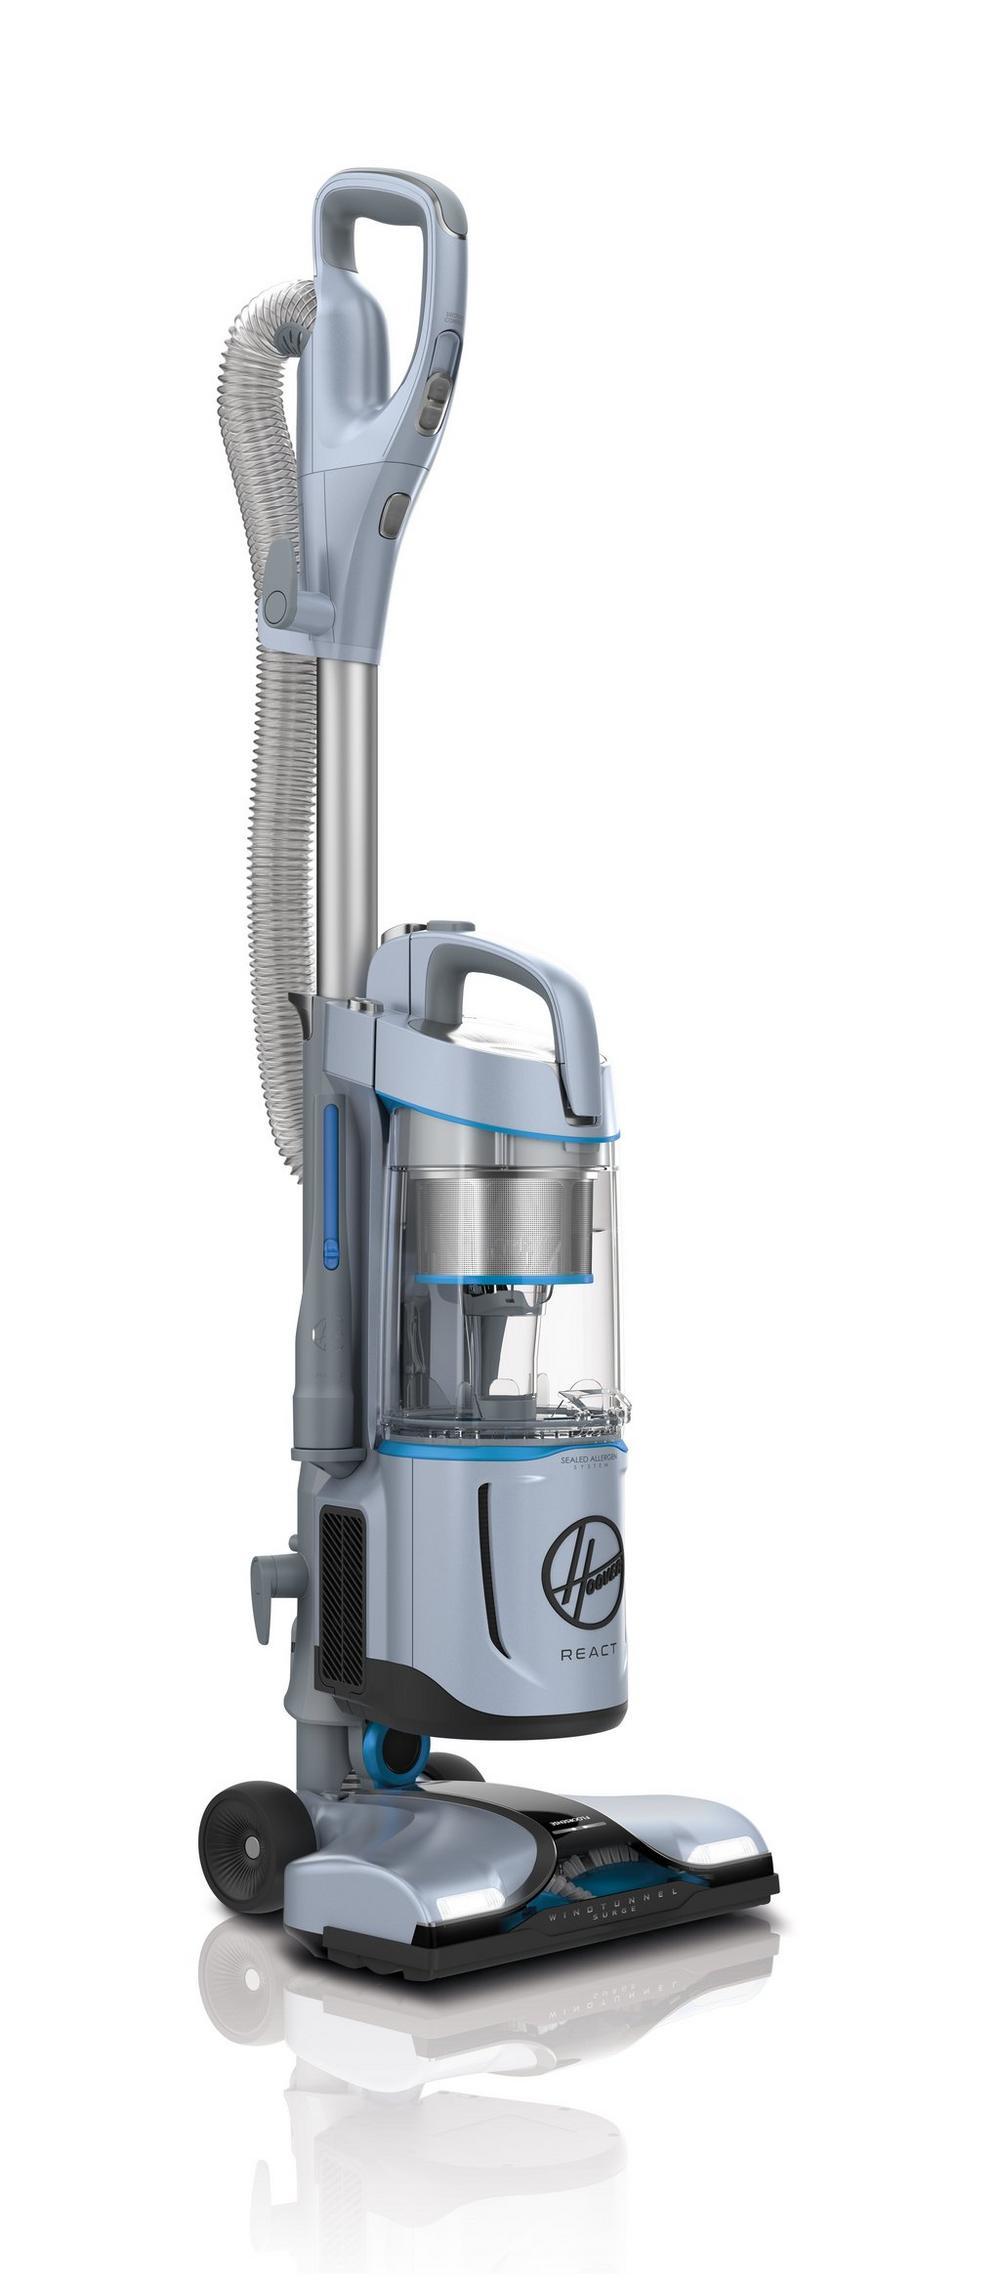 REACT QuickLift Deluxe Upright Vacuum17